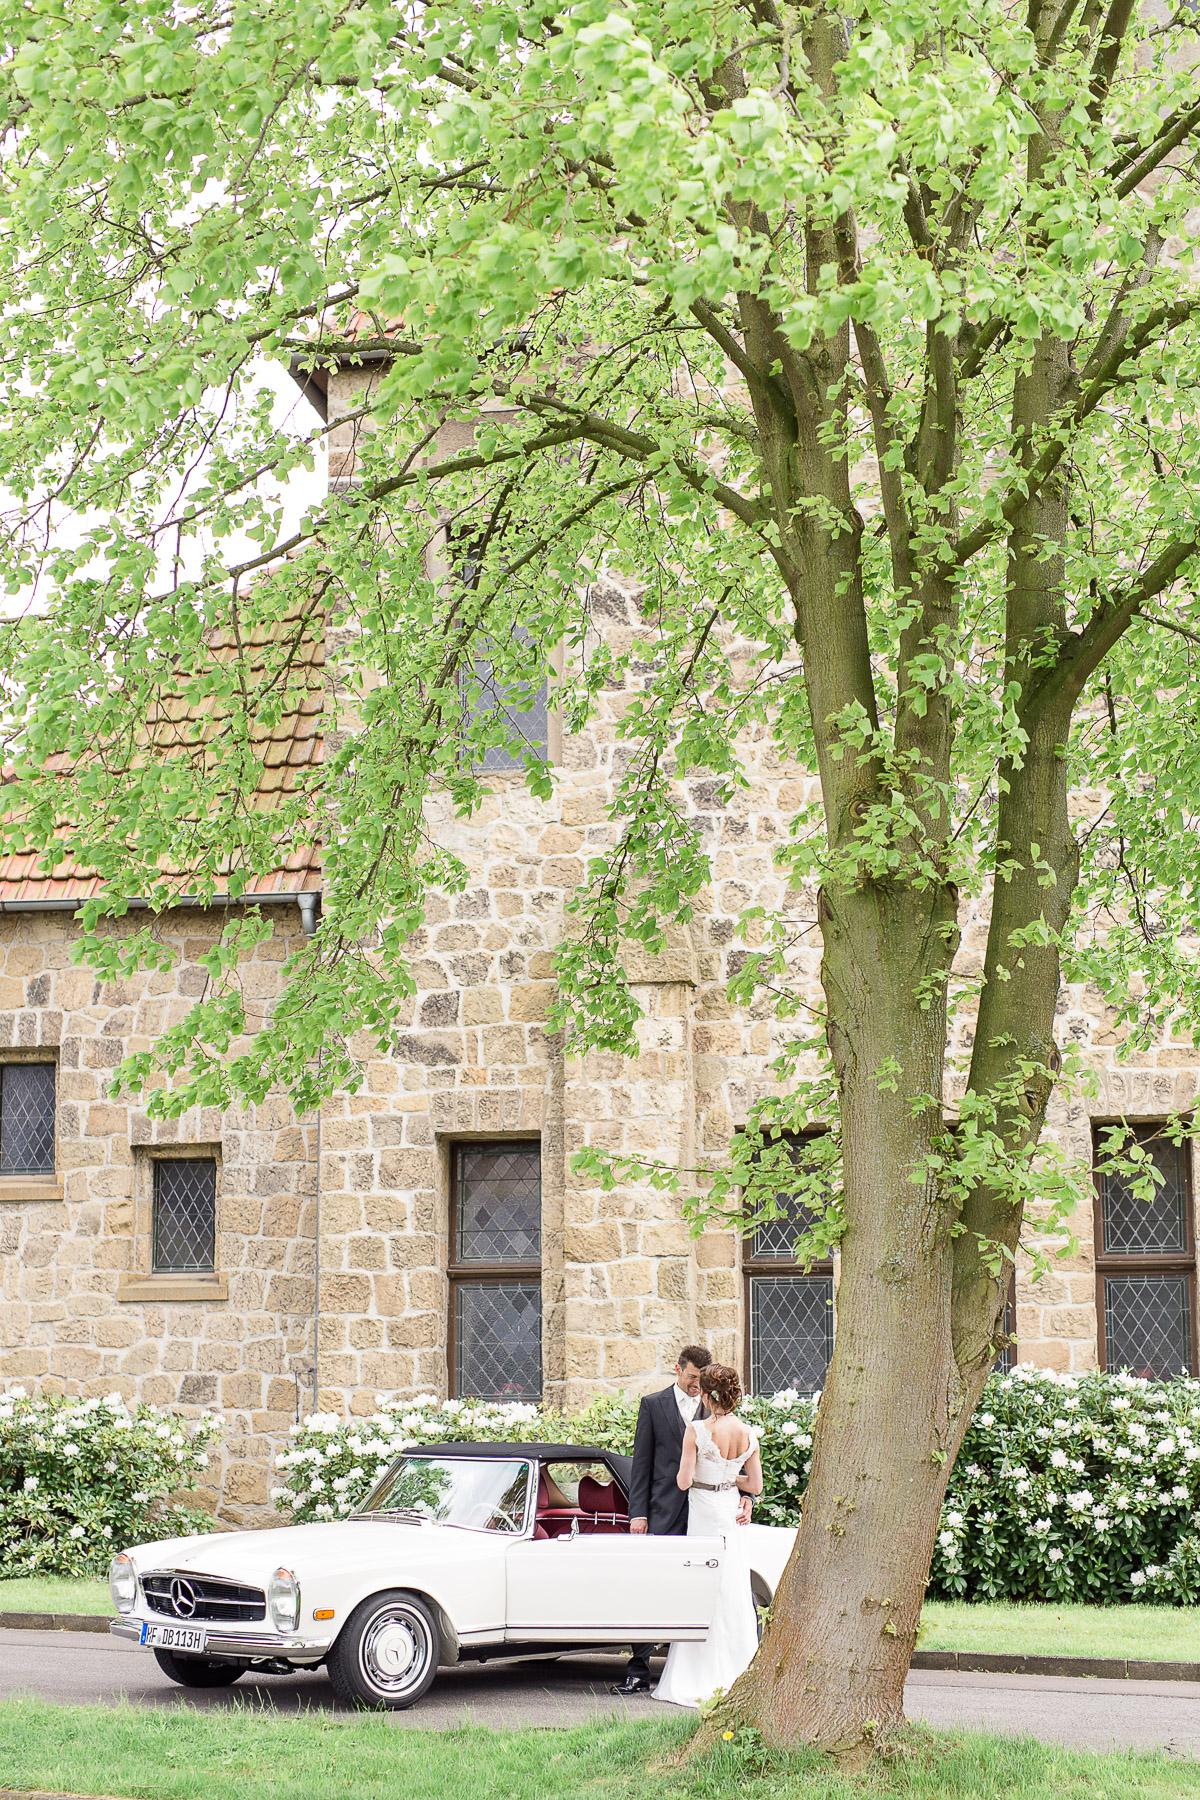 Hochzeitsfotograf-Bielefeld-2015-05-12